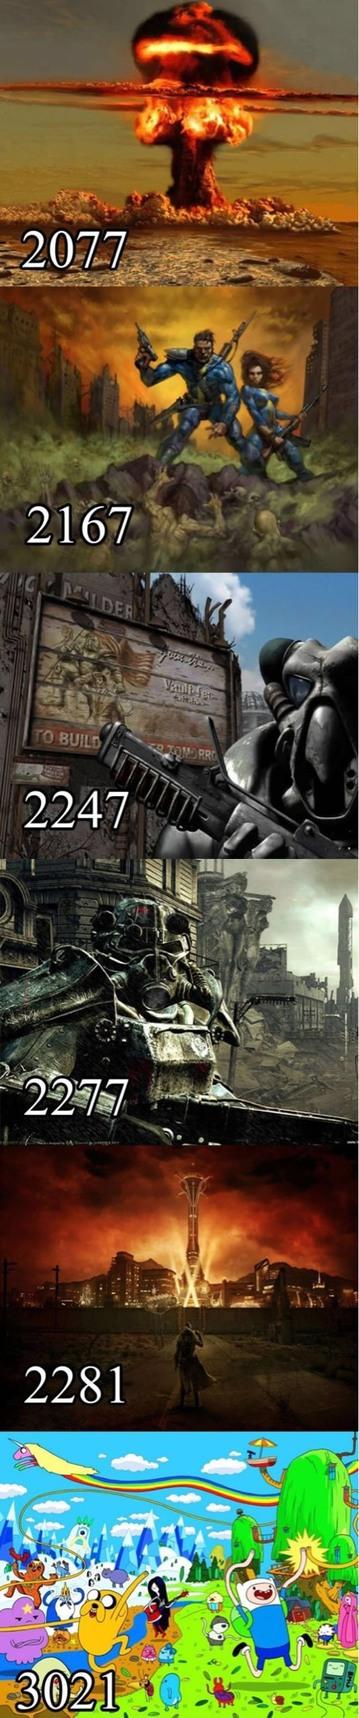 our future... begins - meme